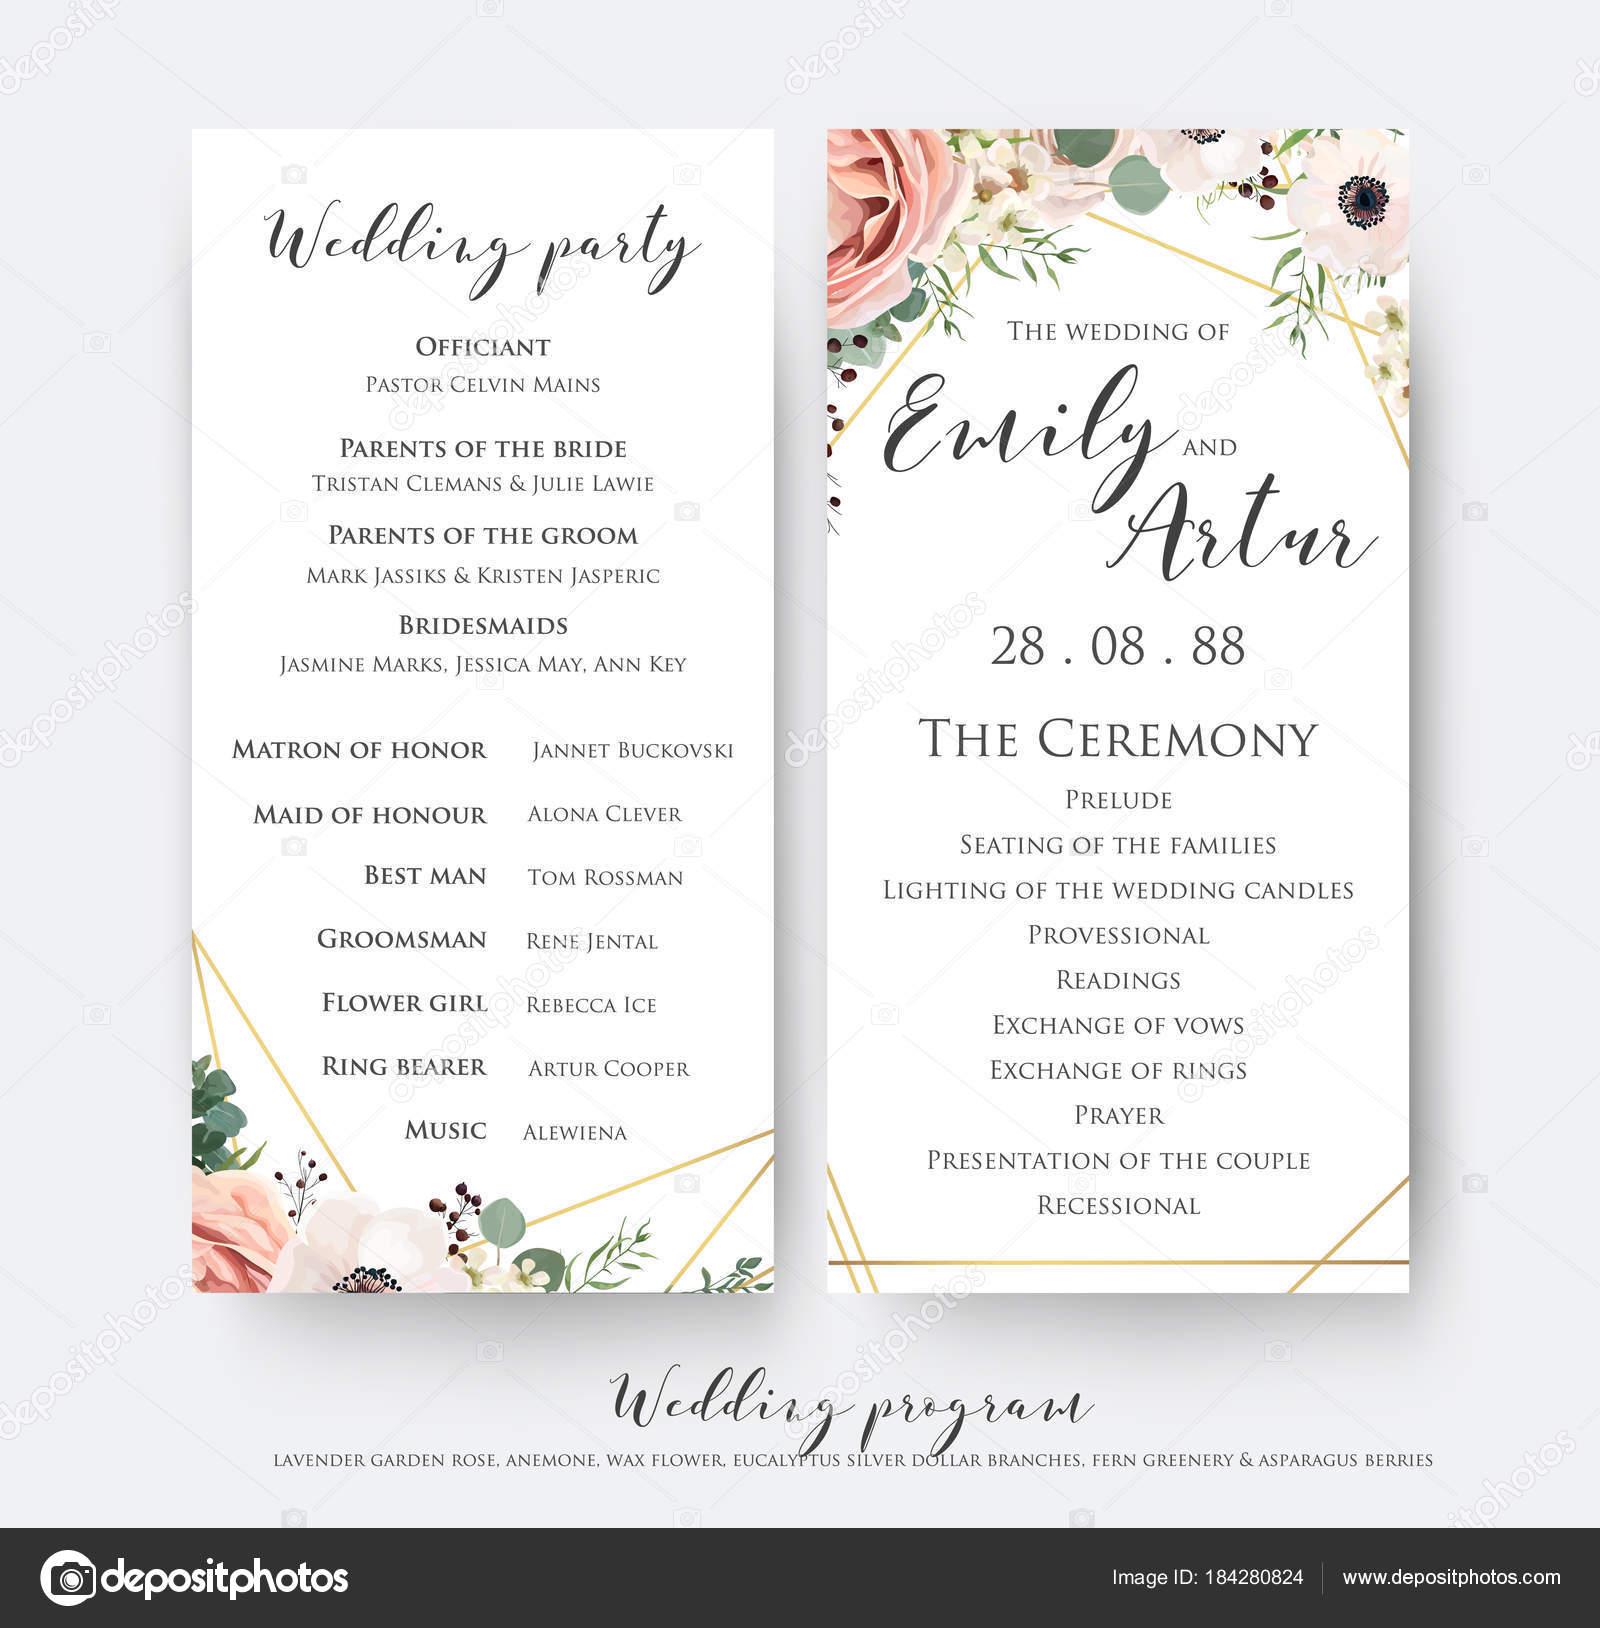 Wedding program for party & ceremony card design with elegant ...